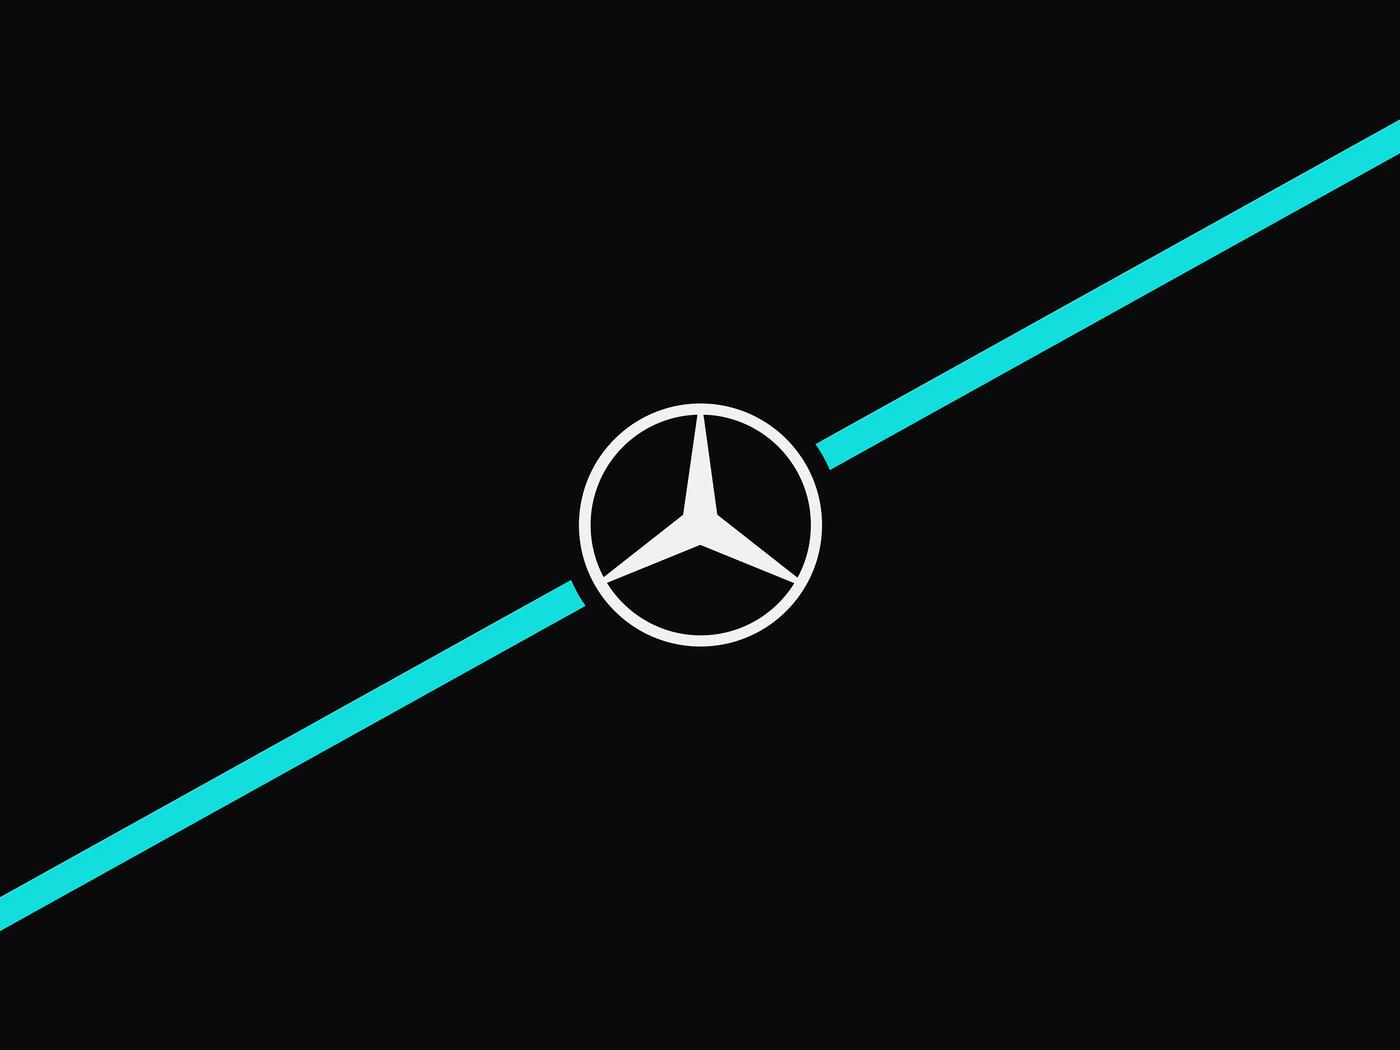 mercedes-logo-dark-minimalism-5k-td.jpg